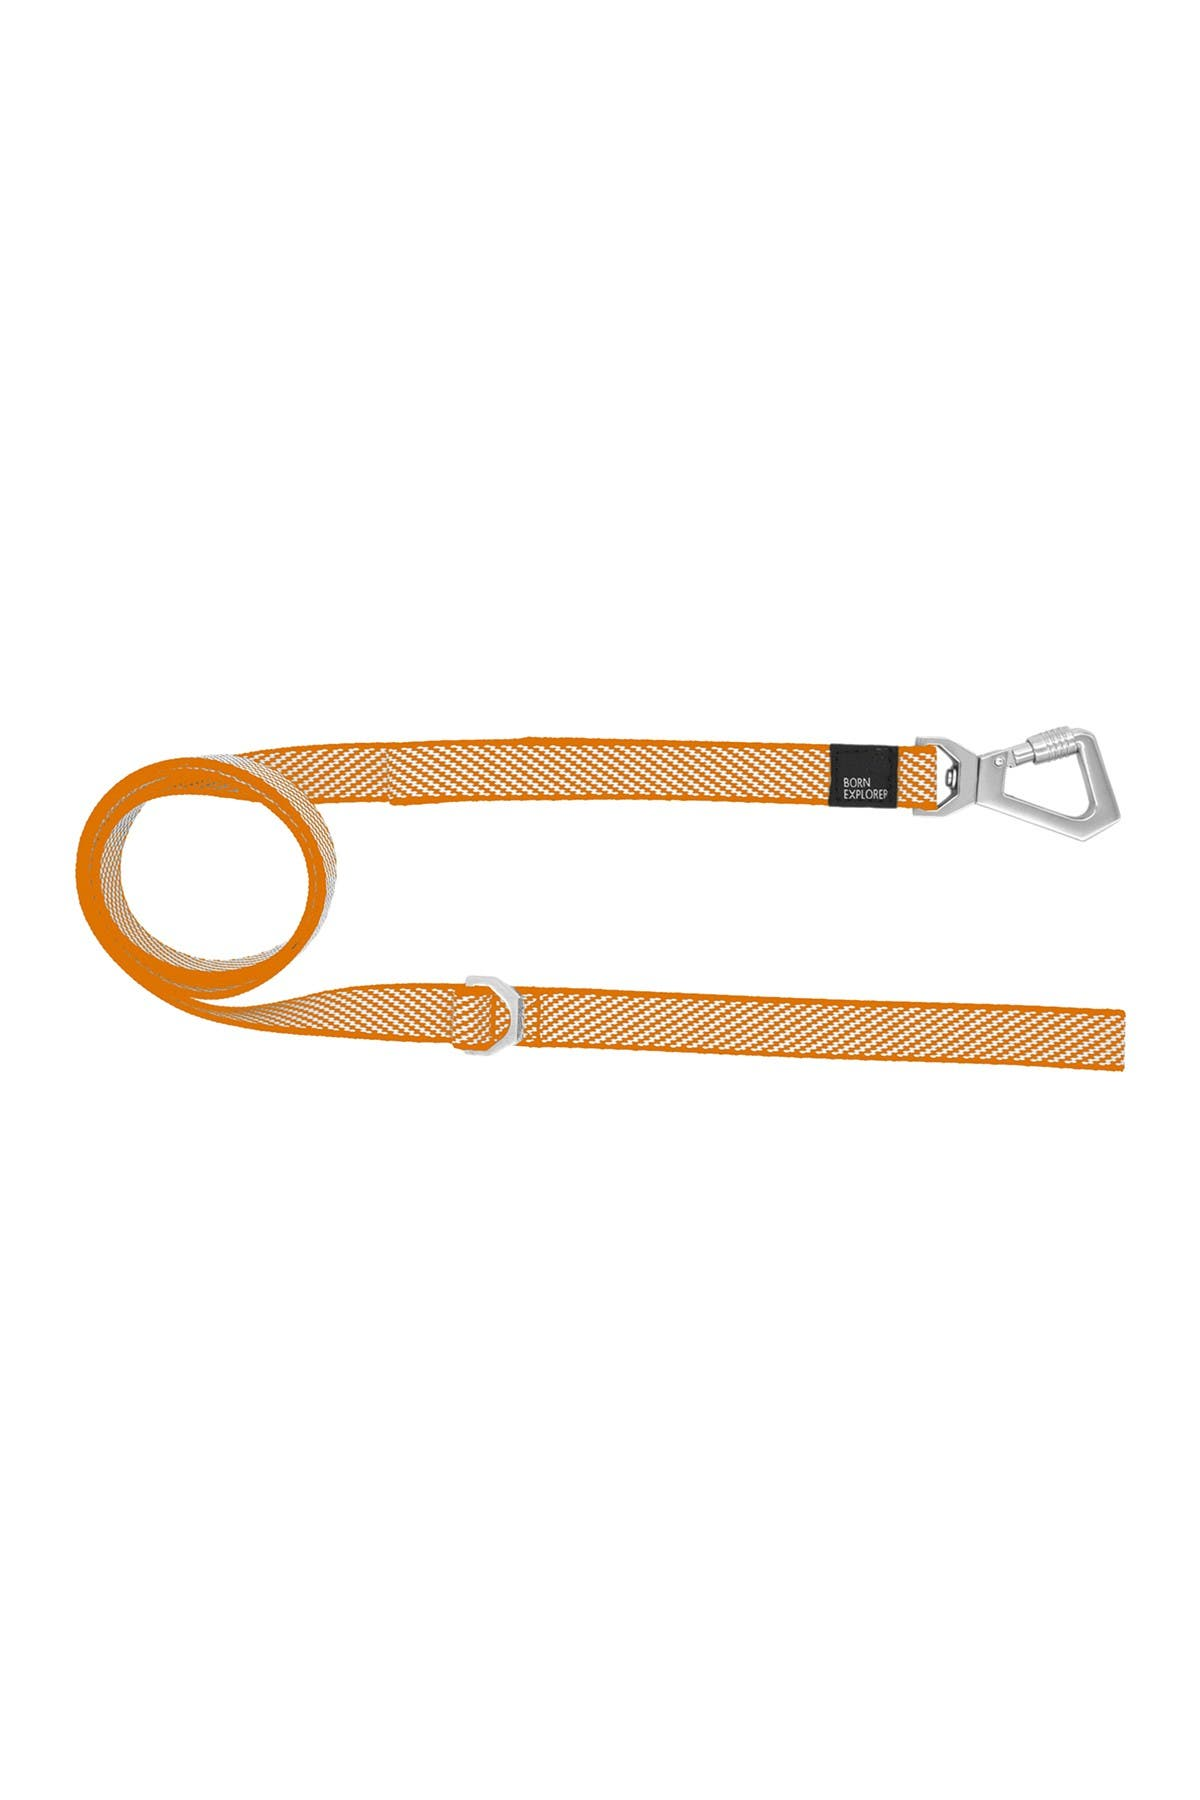 Image of Pet Life 'Escapade' Outdoor Series 2-in-1 Convertible Dog Leash & Harness - Medium